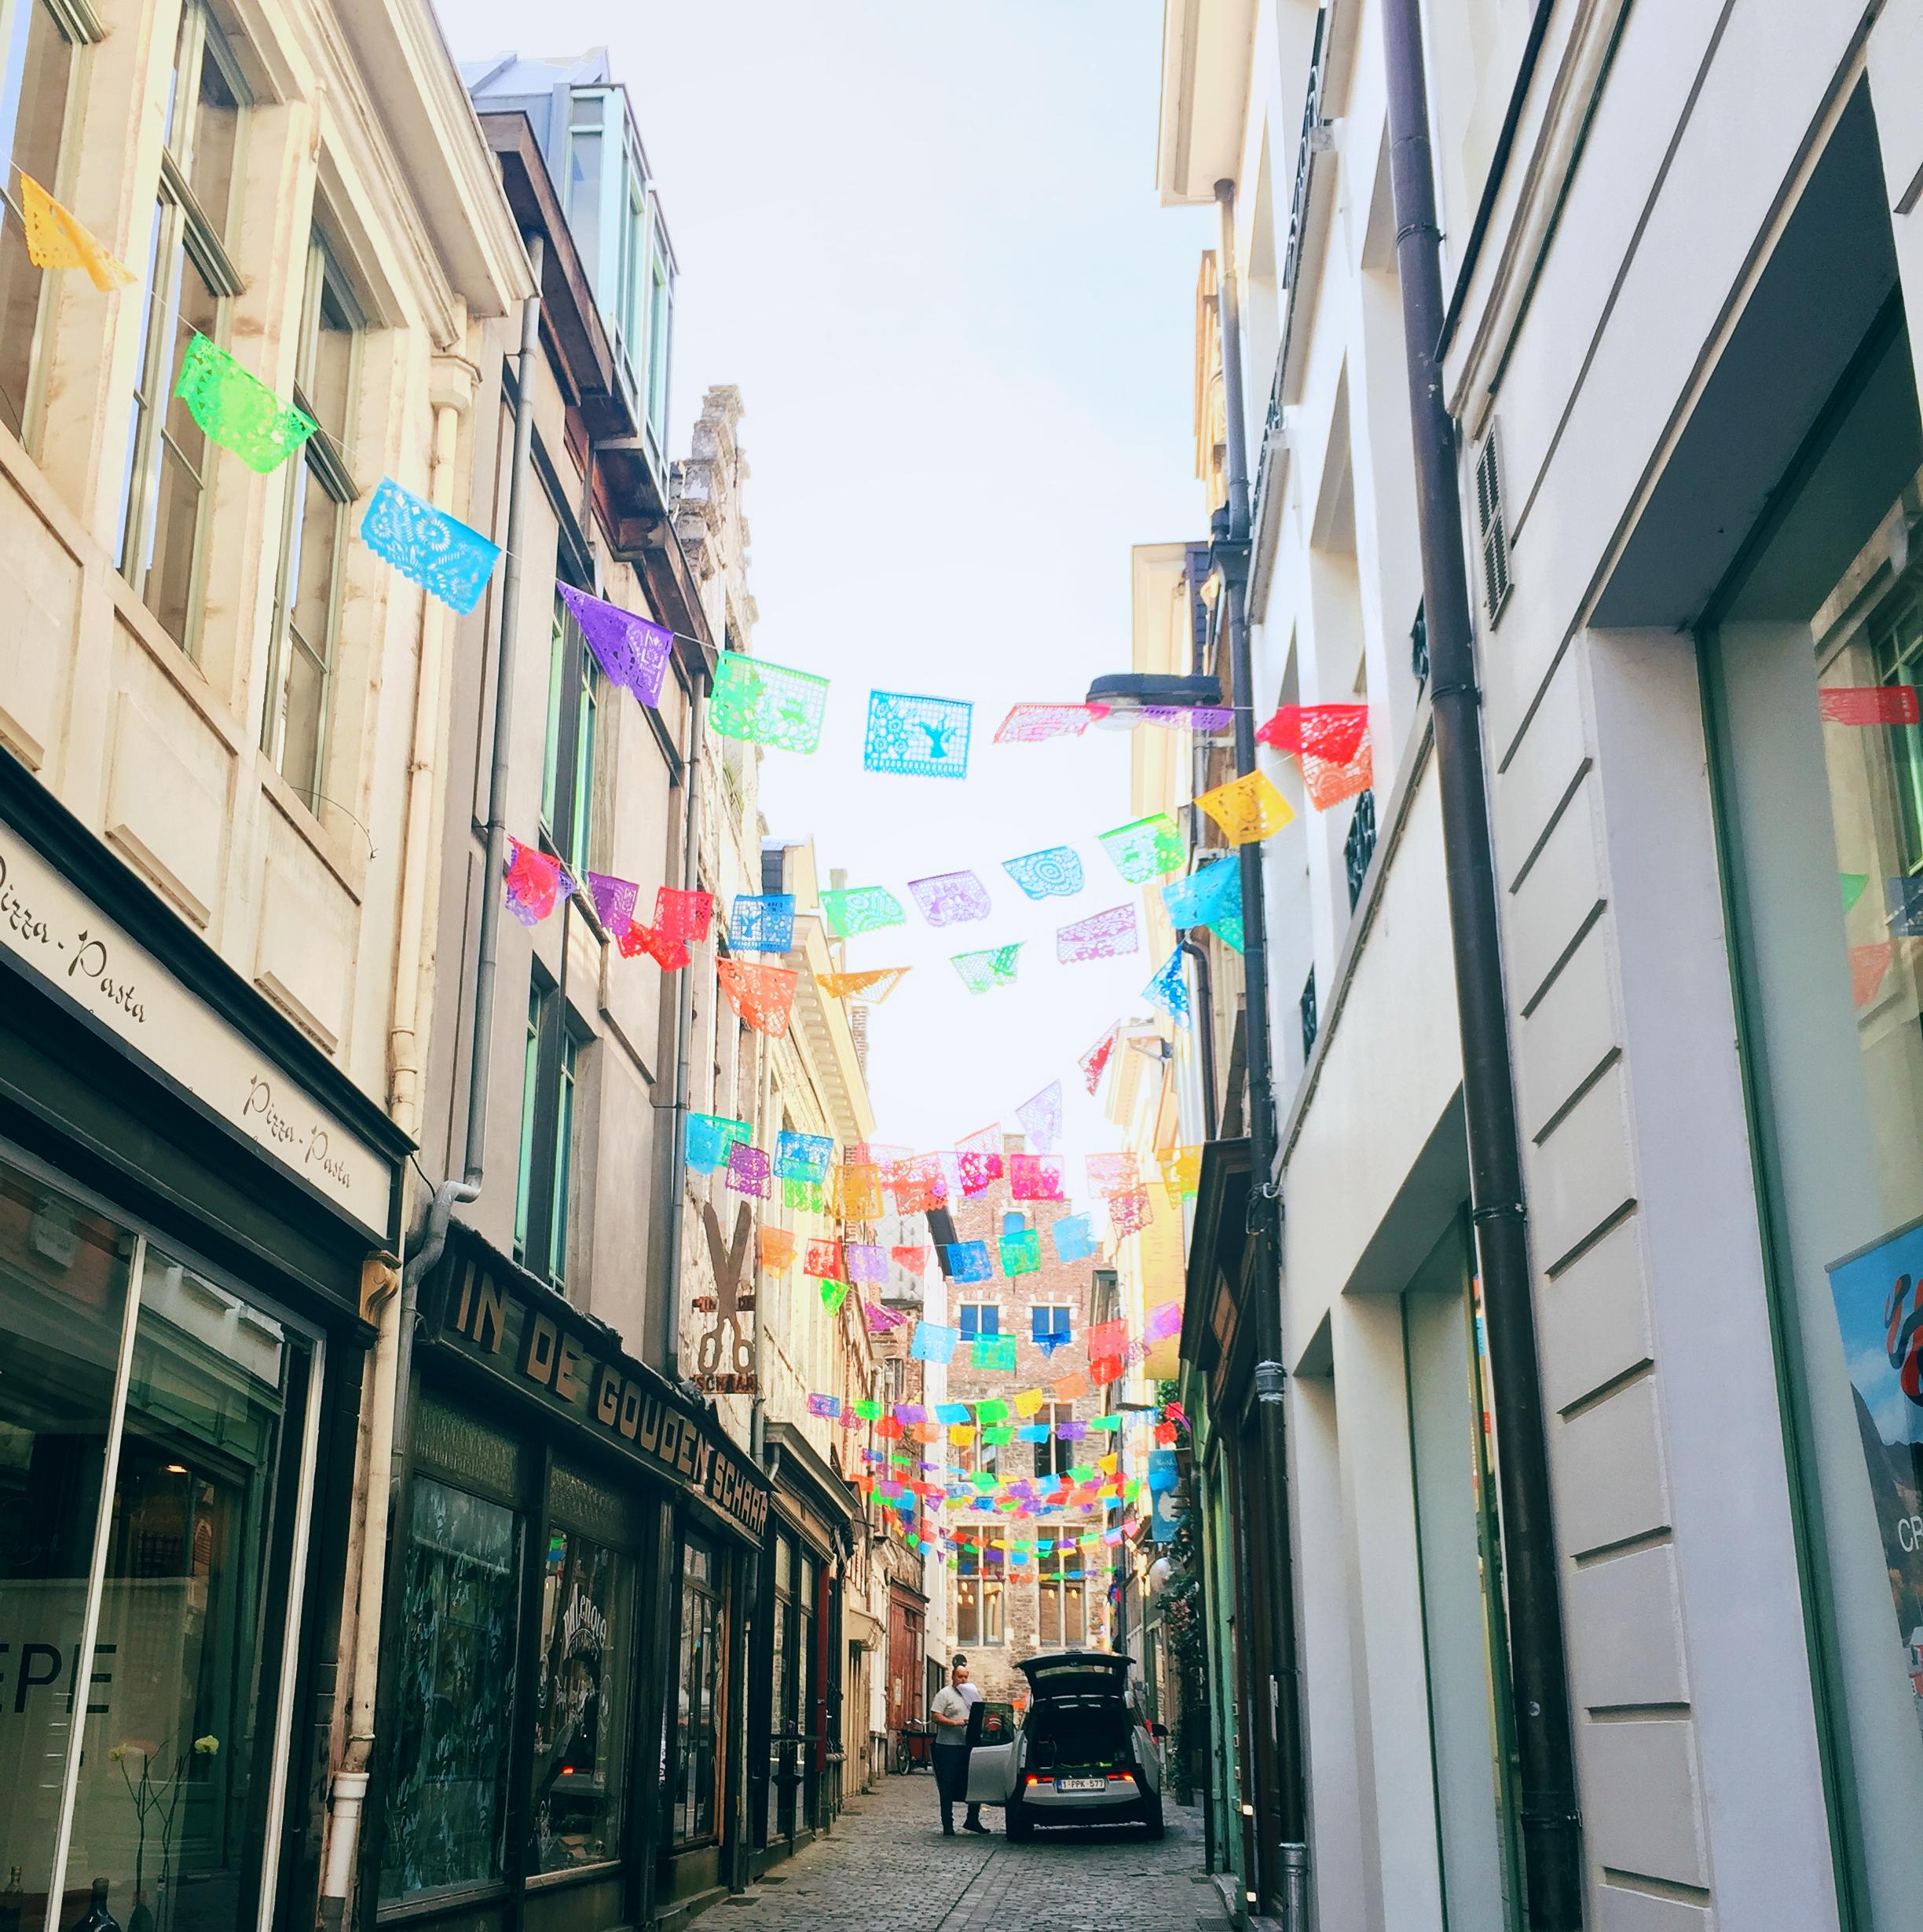 Pretty street in Ghent